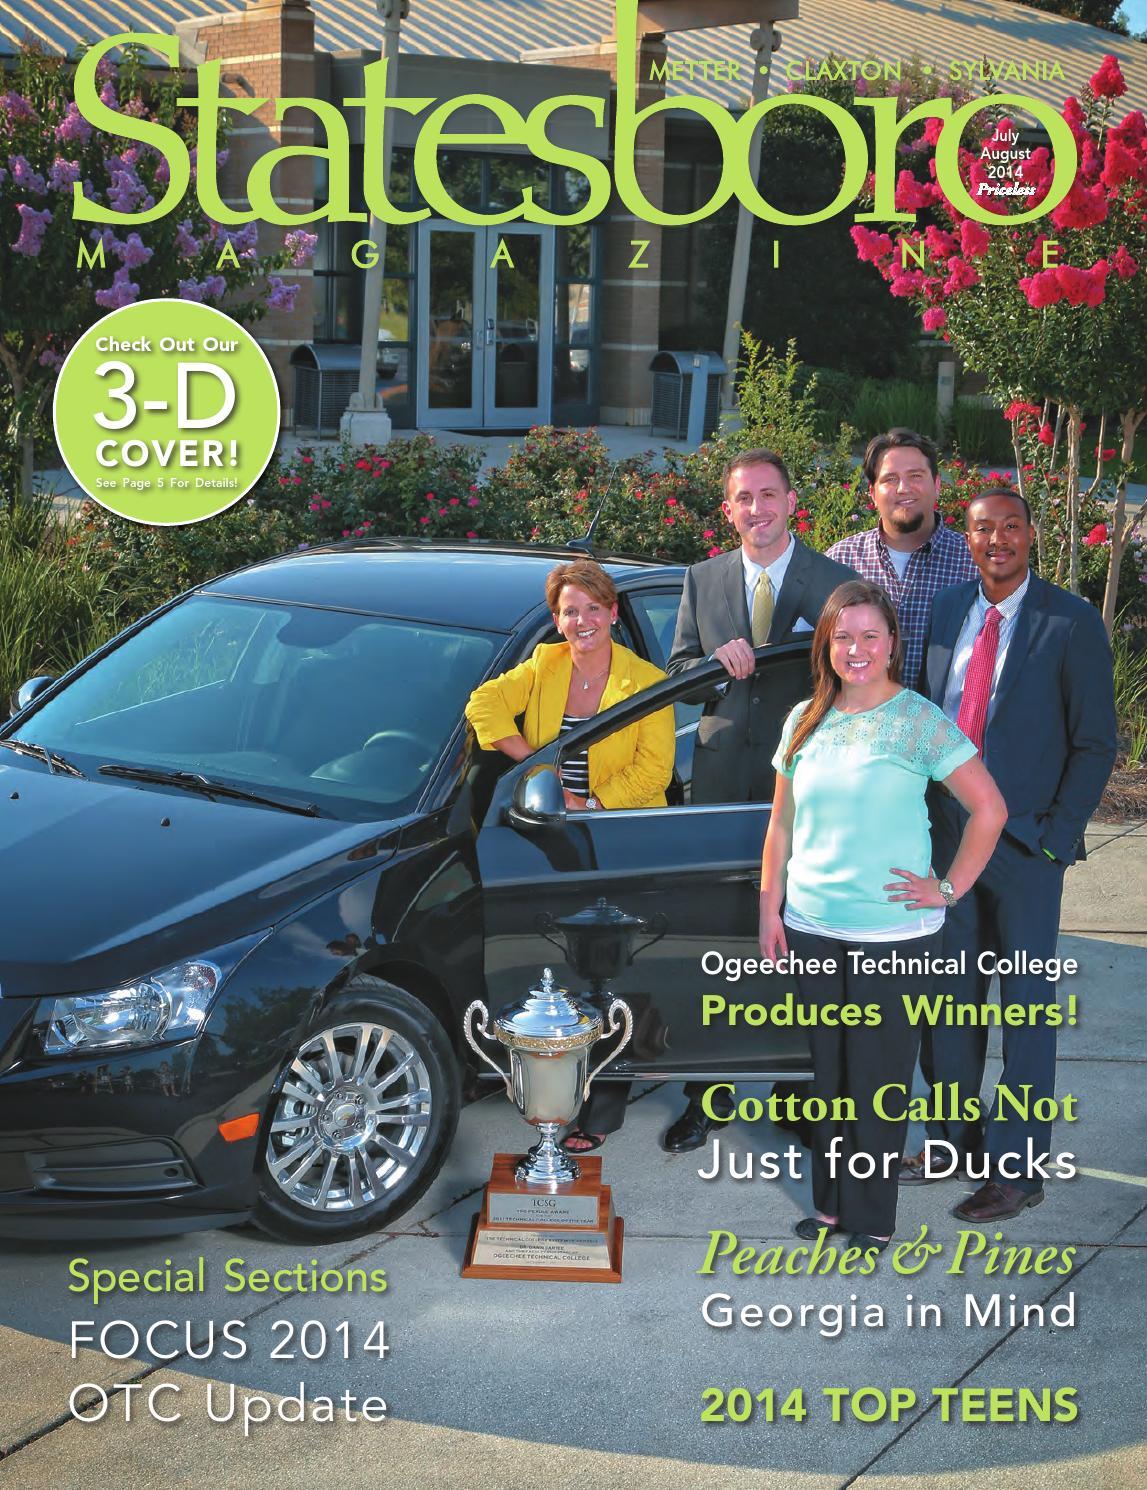 Statesboro Magazine July August 2014 By